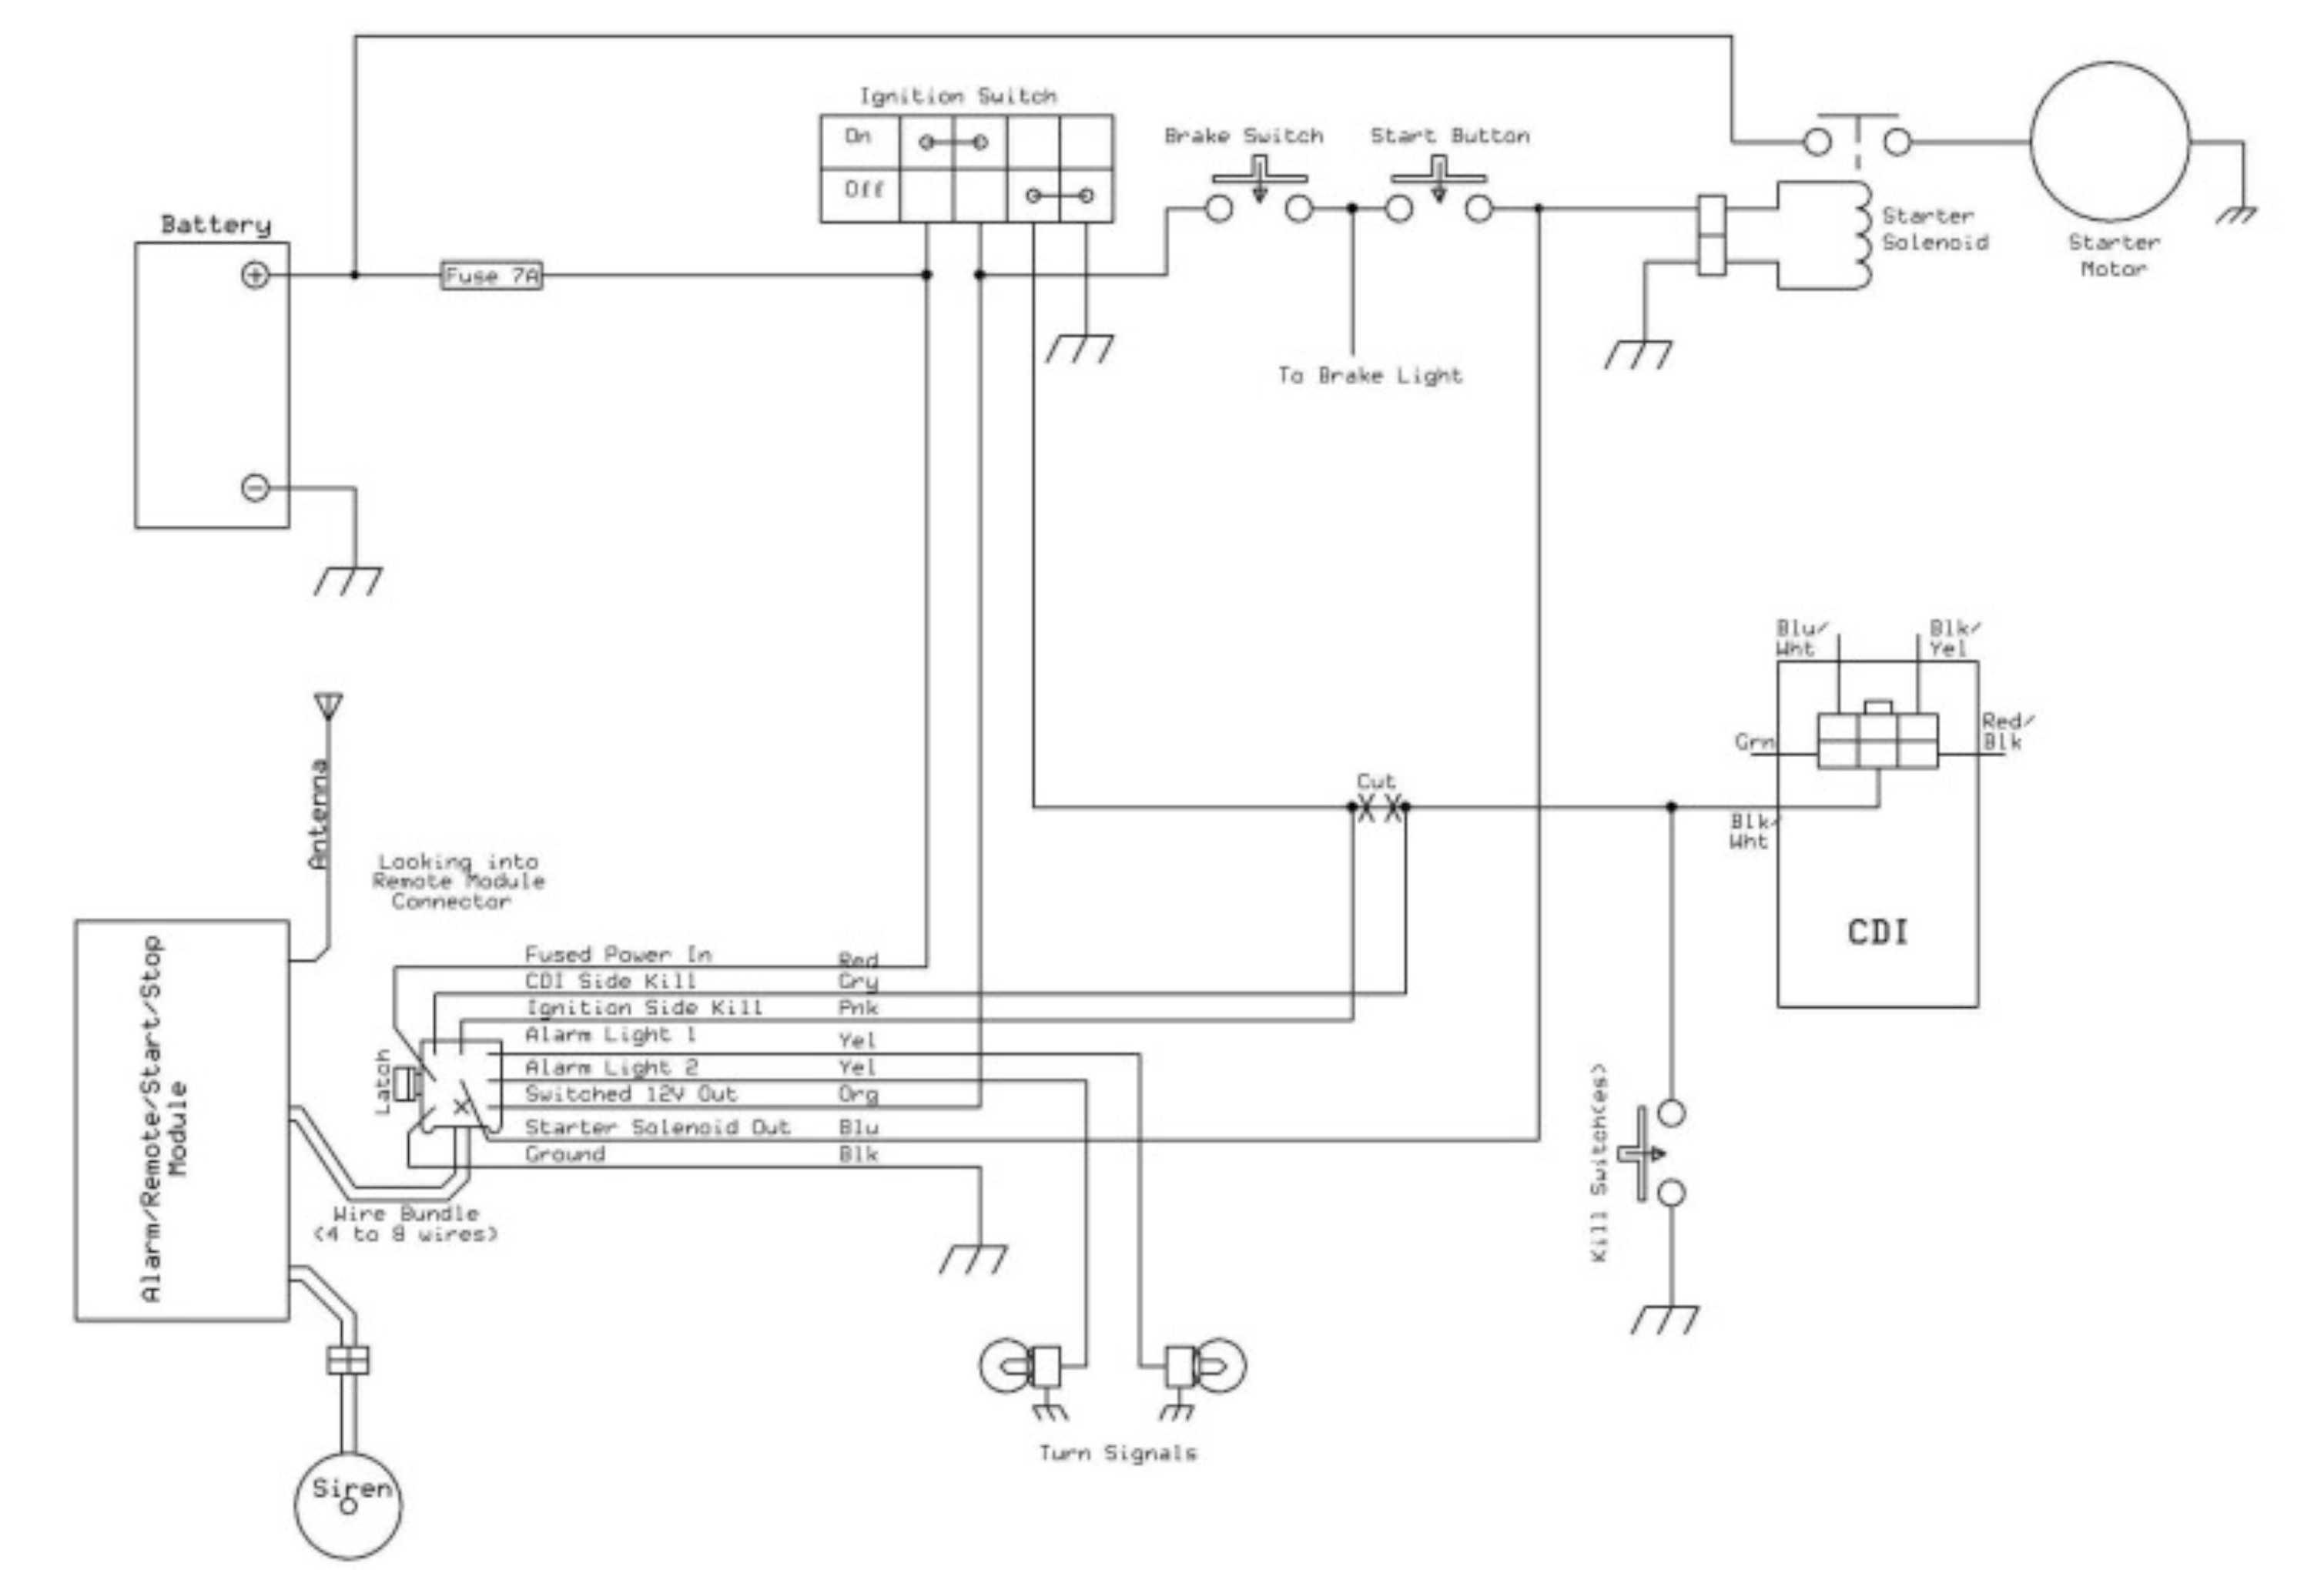 Motorcycle Remote Start Wiring Diagram Schematics Viper 4103 How To Install A Starter On Motorssite Org Avital